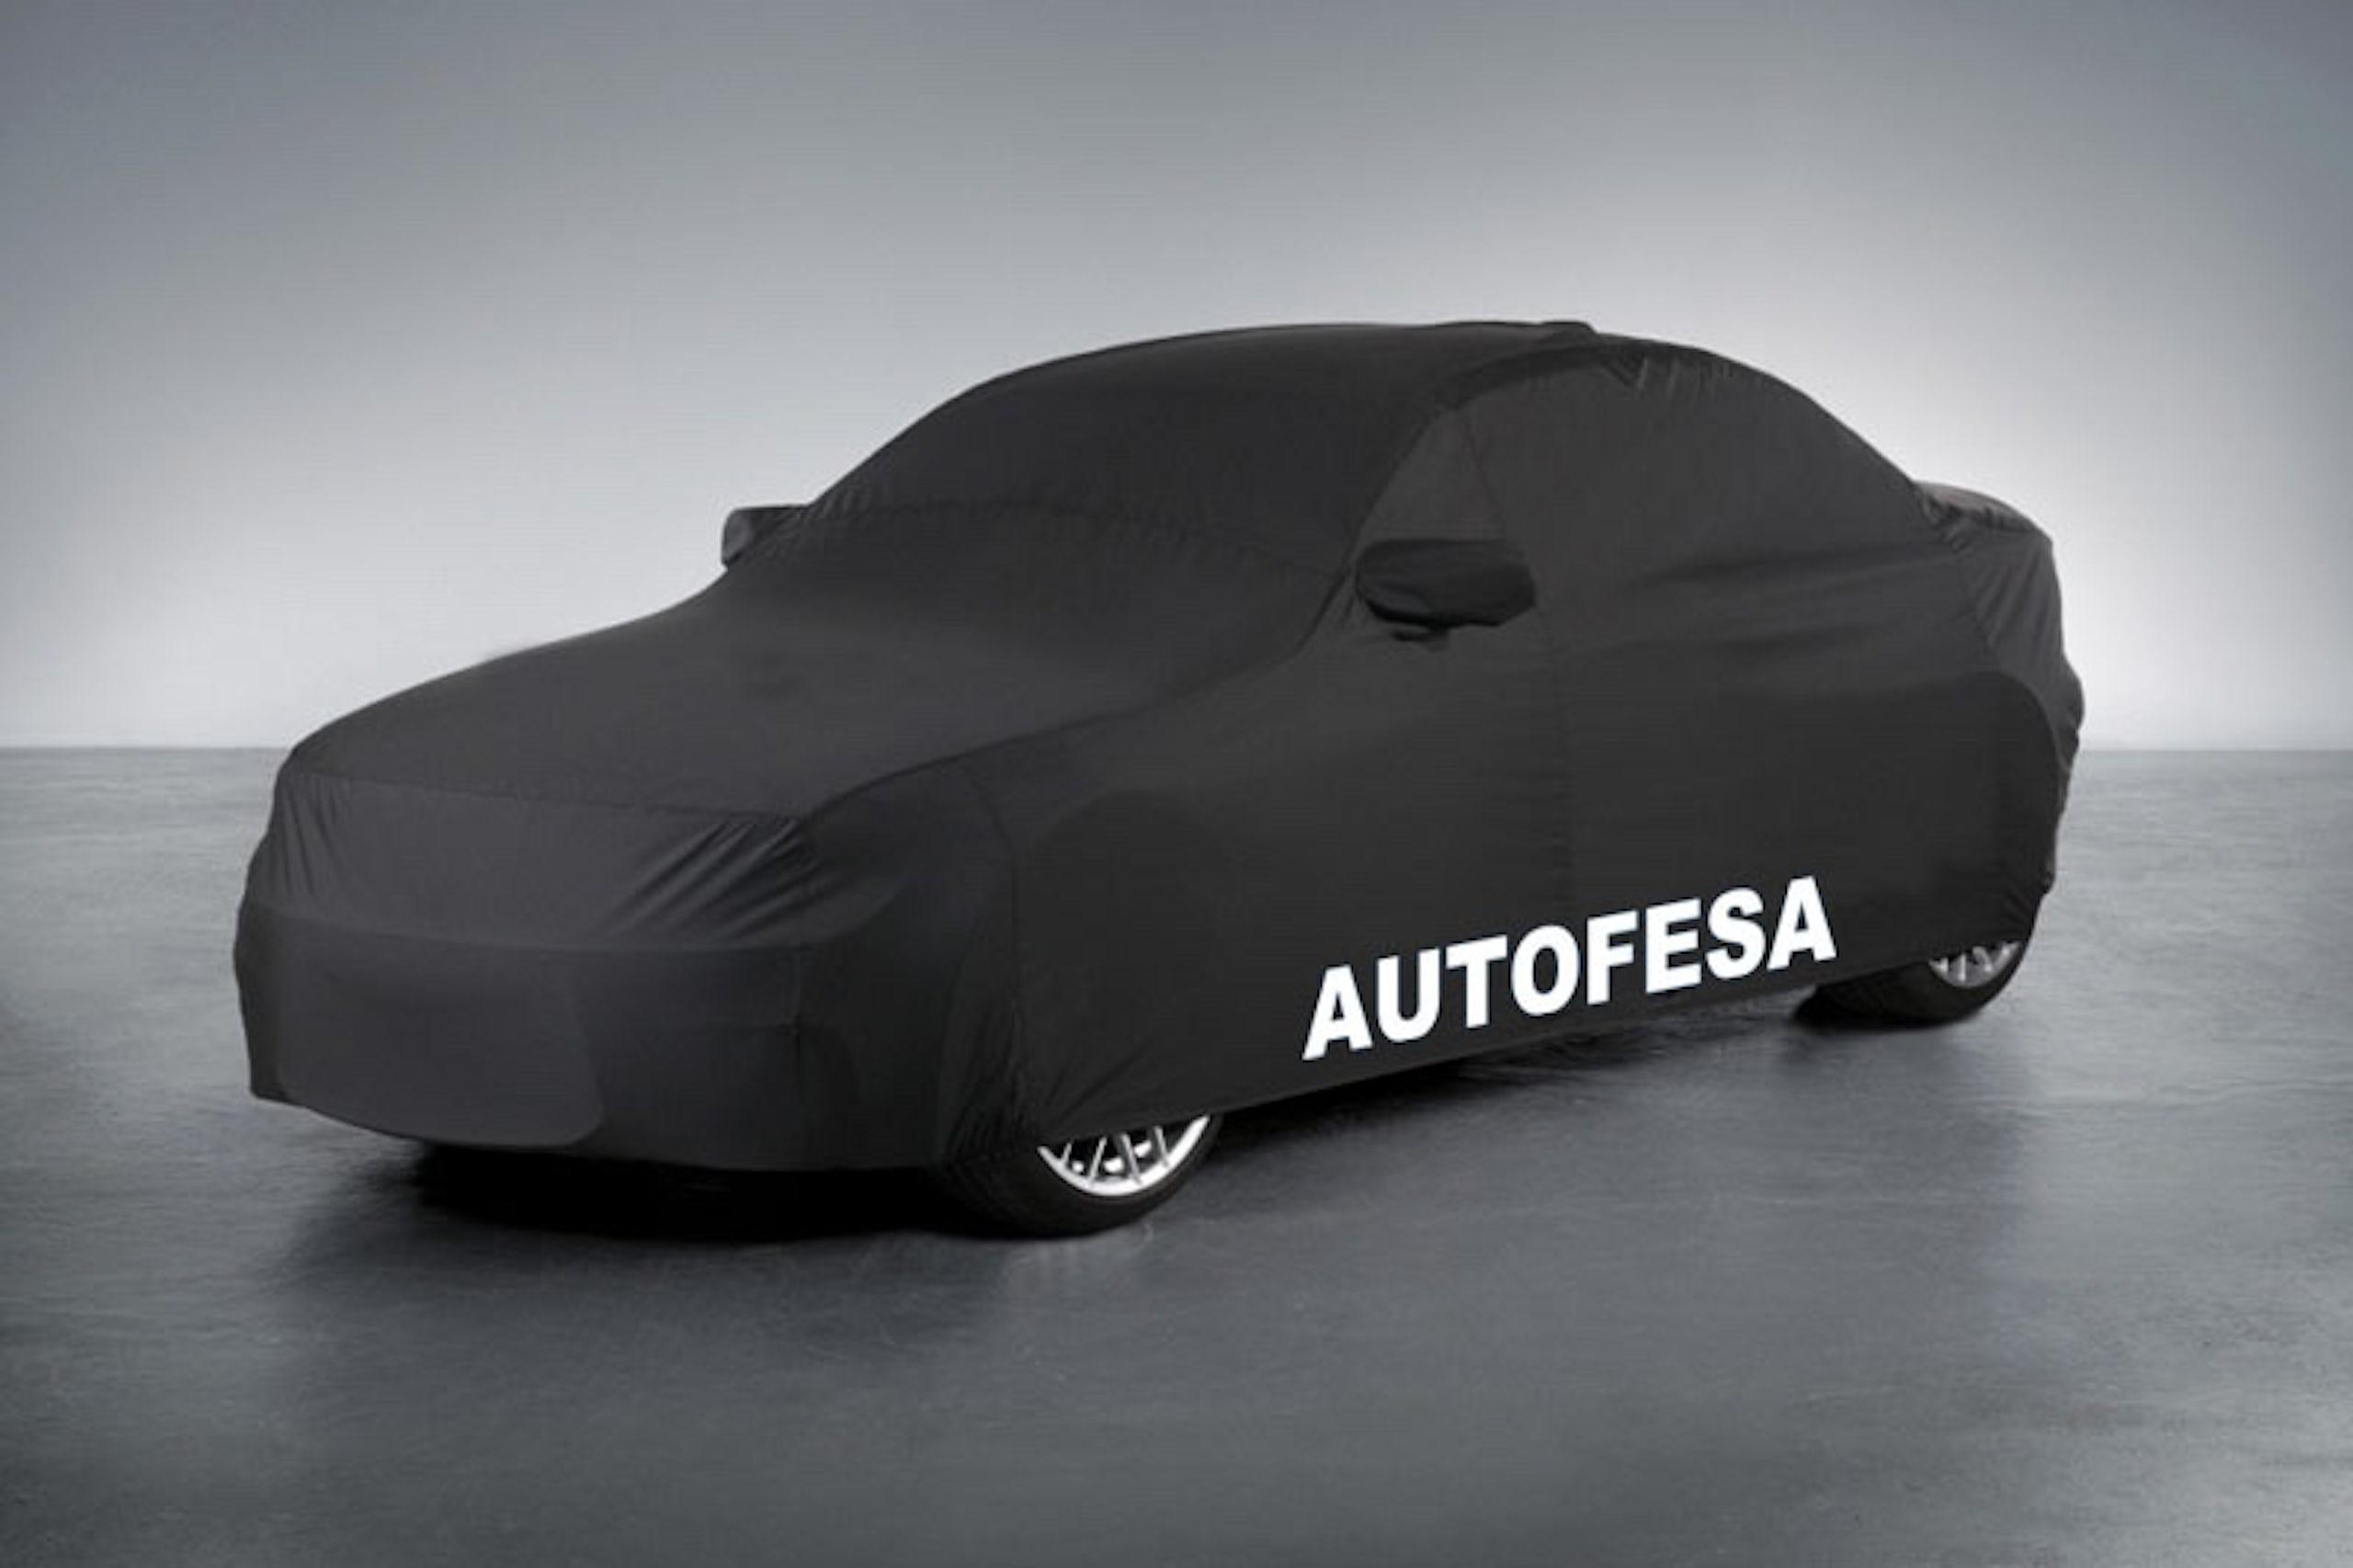 Volvo Xc 60 2.0 T8 Twin Momentum Hybrido Enchufable AWD Auto 407cv 5p S/S - Foto 35